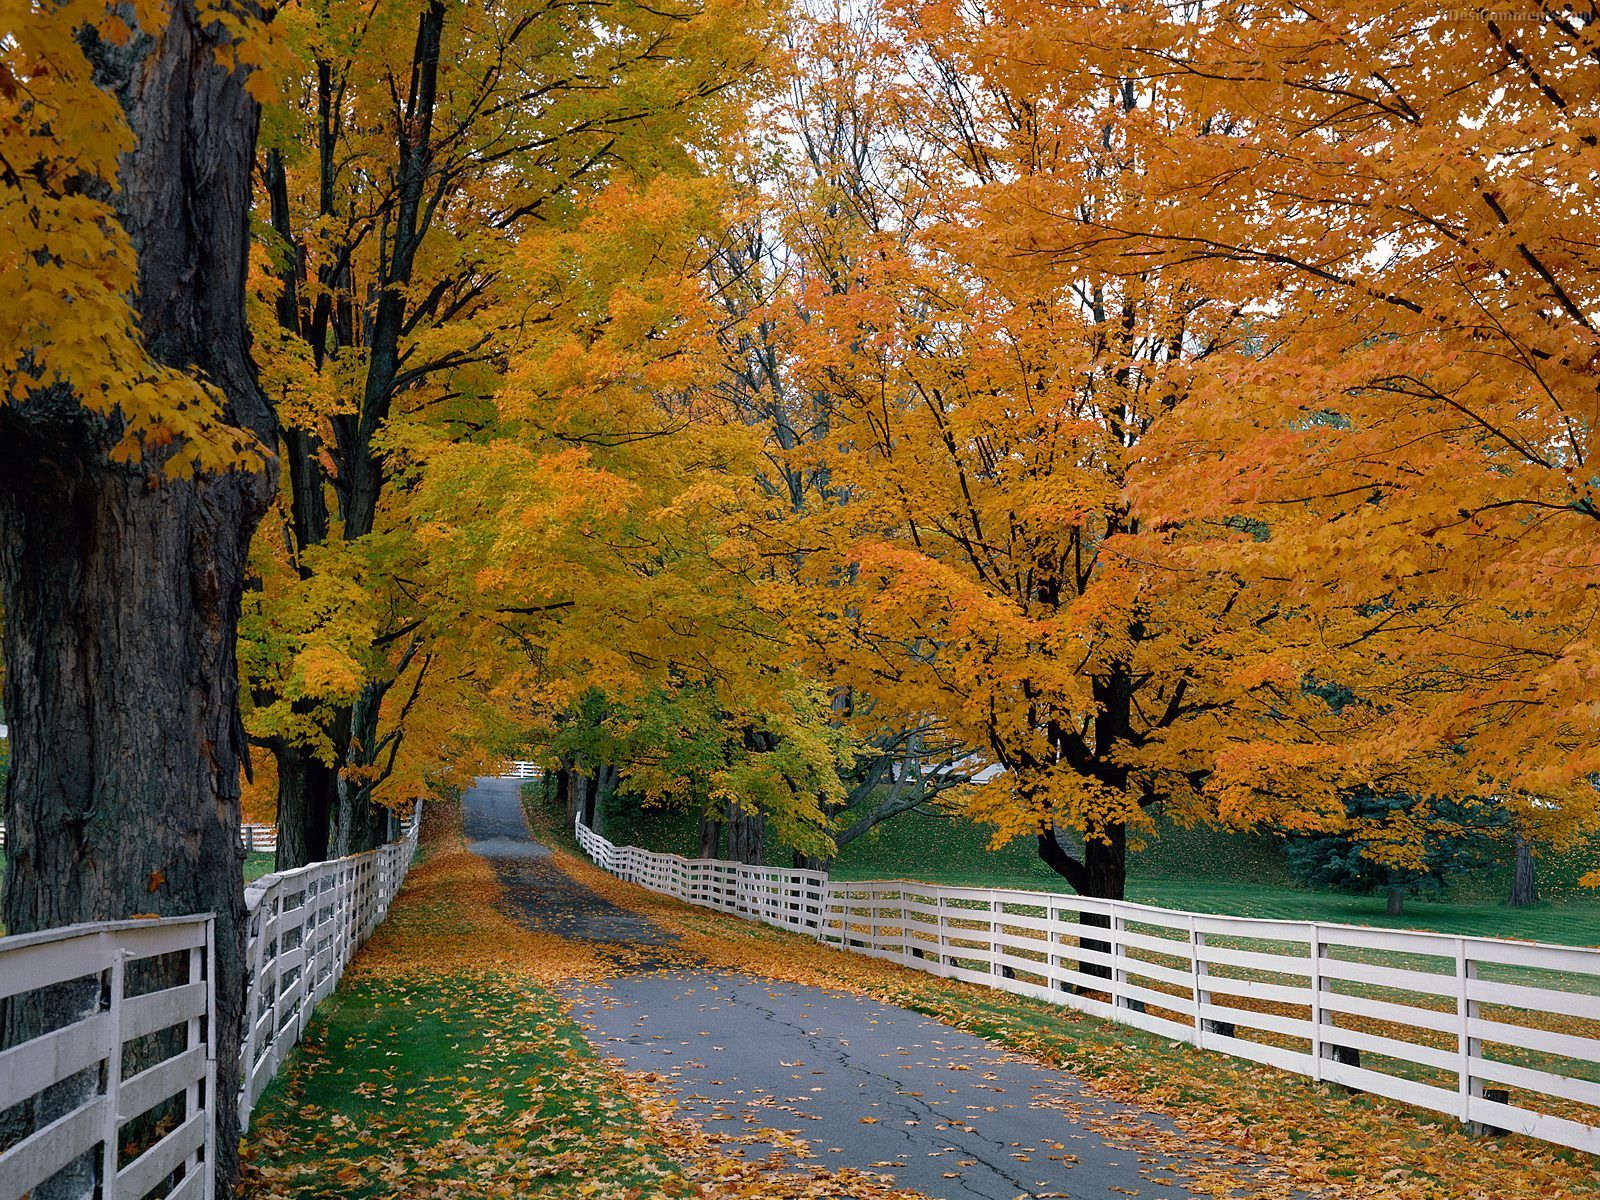 The best top autumn desktop wallpapers 17 En Güzel Sonbahar HD Duvar Kağıtları